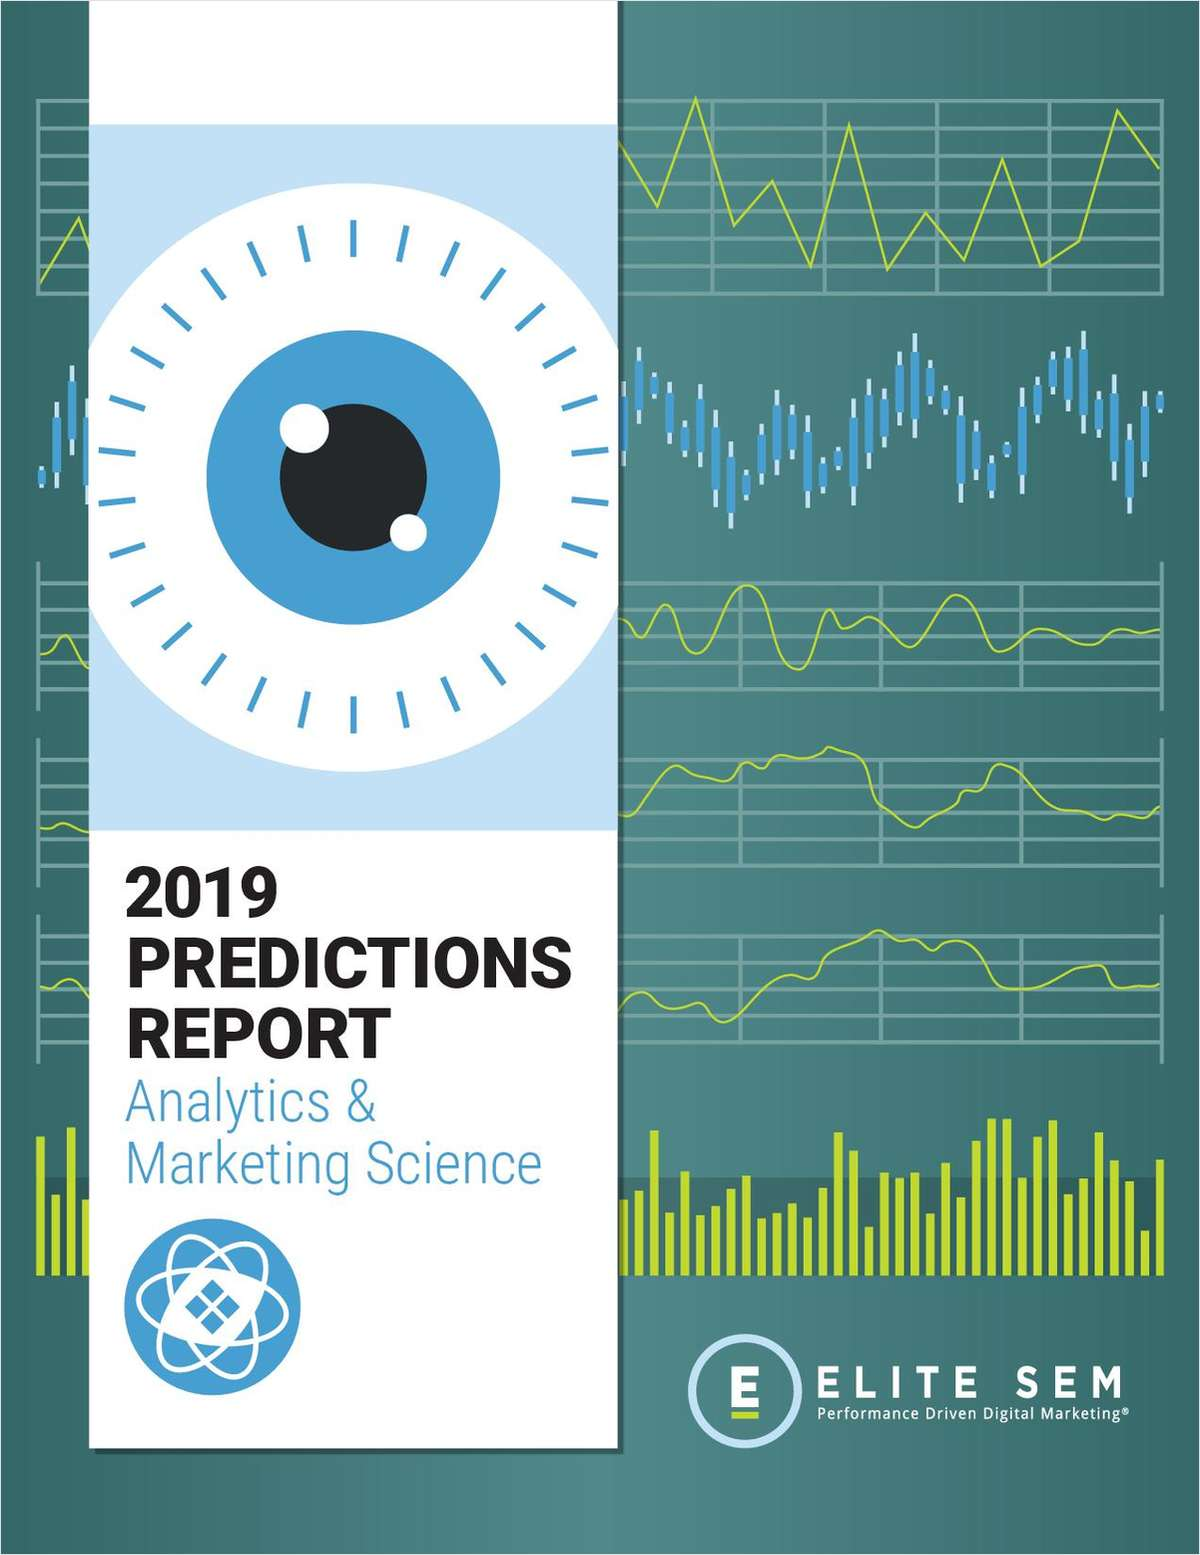 2019 Predictions Report: Analytics & Marketing Science